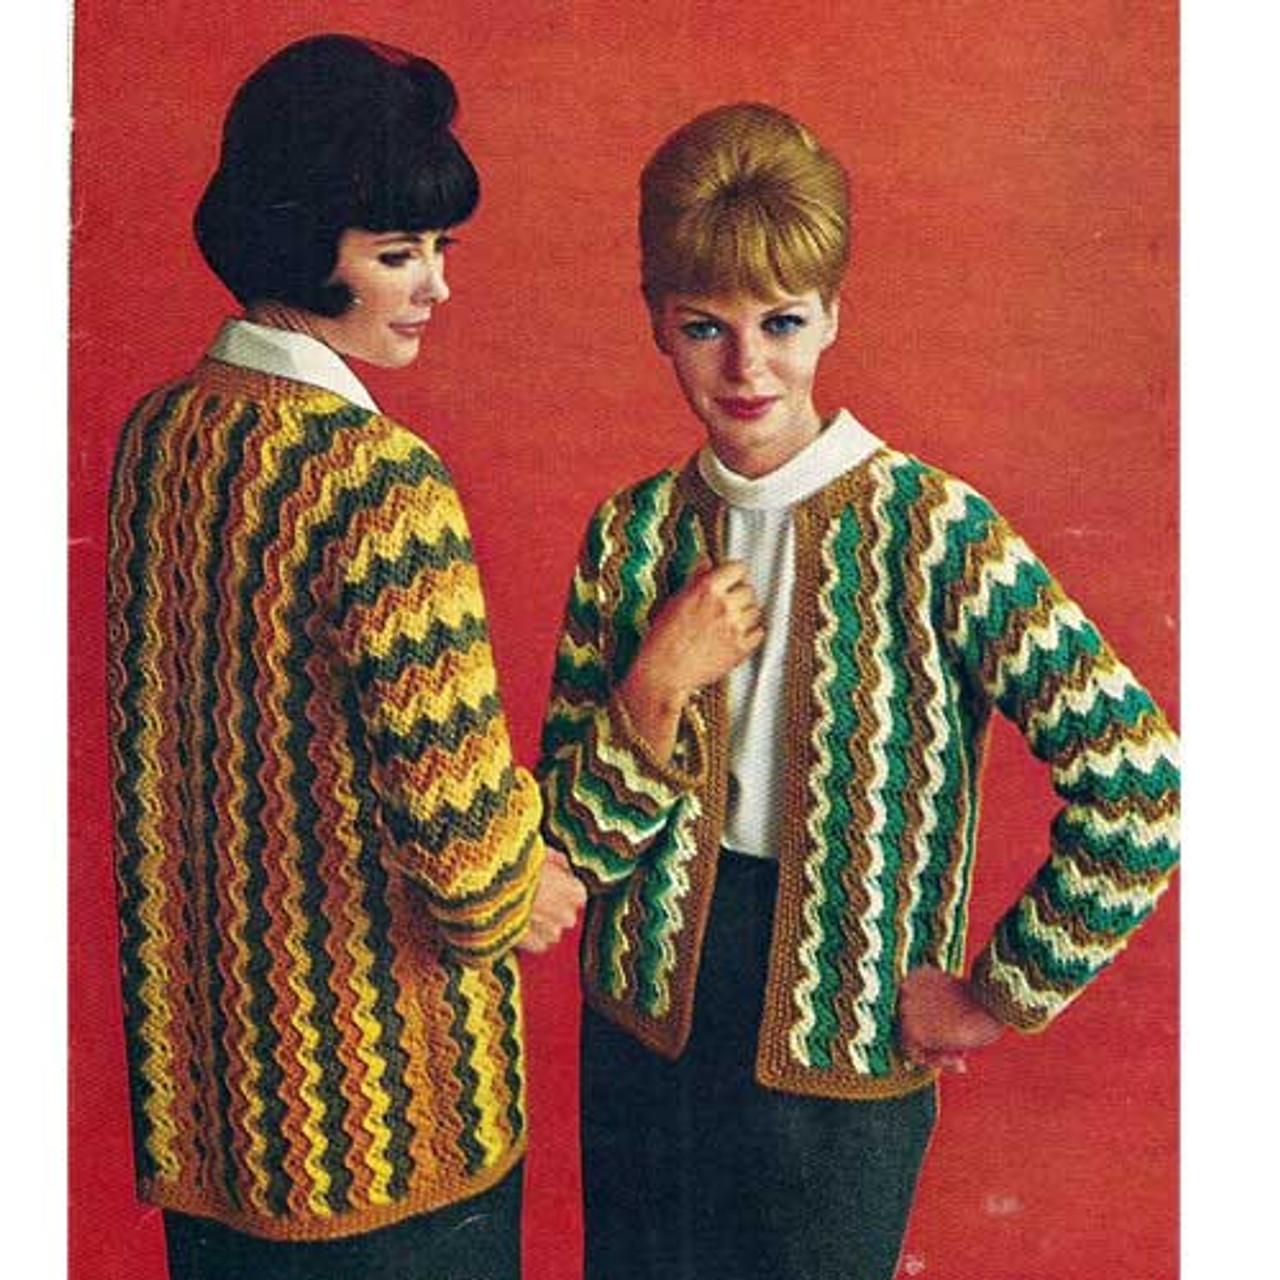 Vintage Crochet Ripple Jackets Pattern